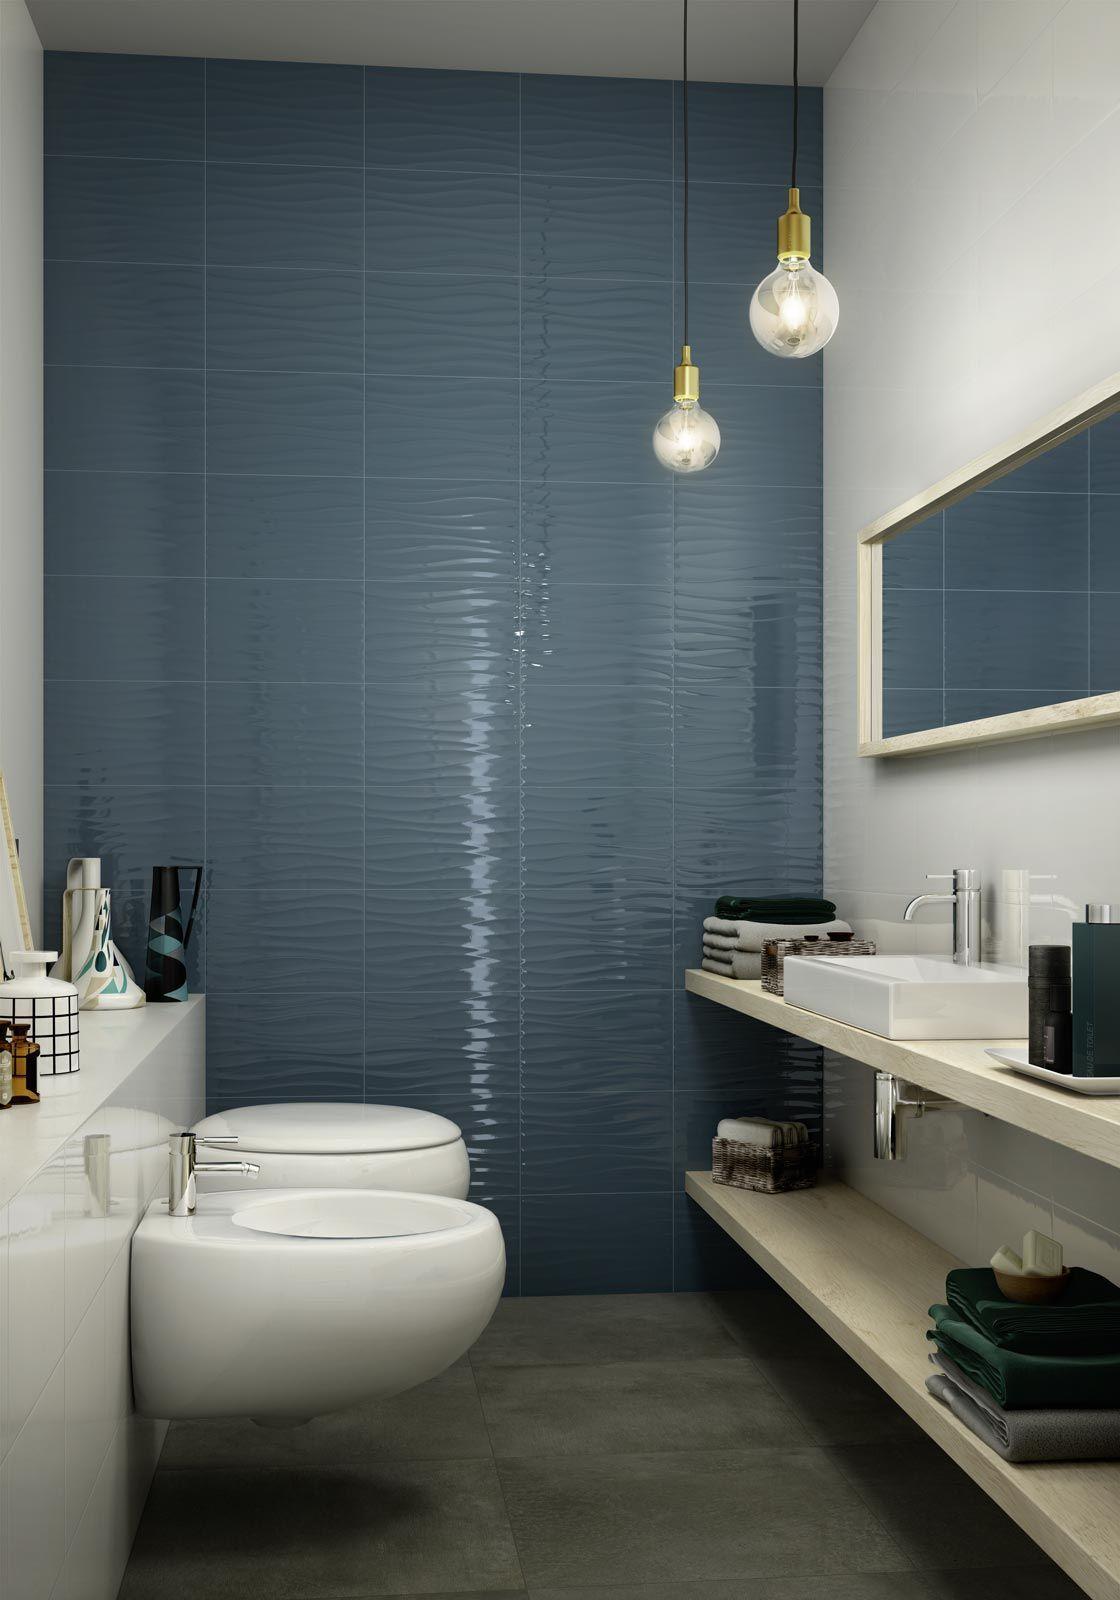 Ragno Piastrelle Bagno 7491 In 2020 Badezimmer Dusche Fliesen Badezimmer Dachgeschoss Badezimmer